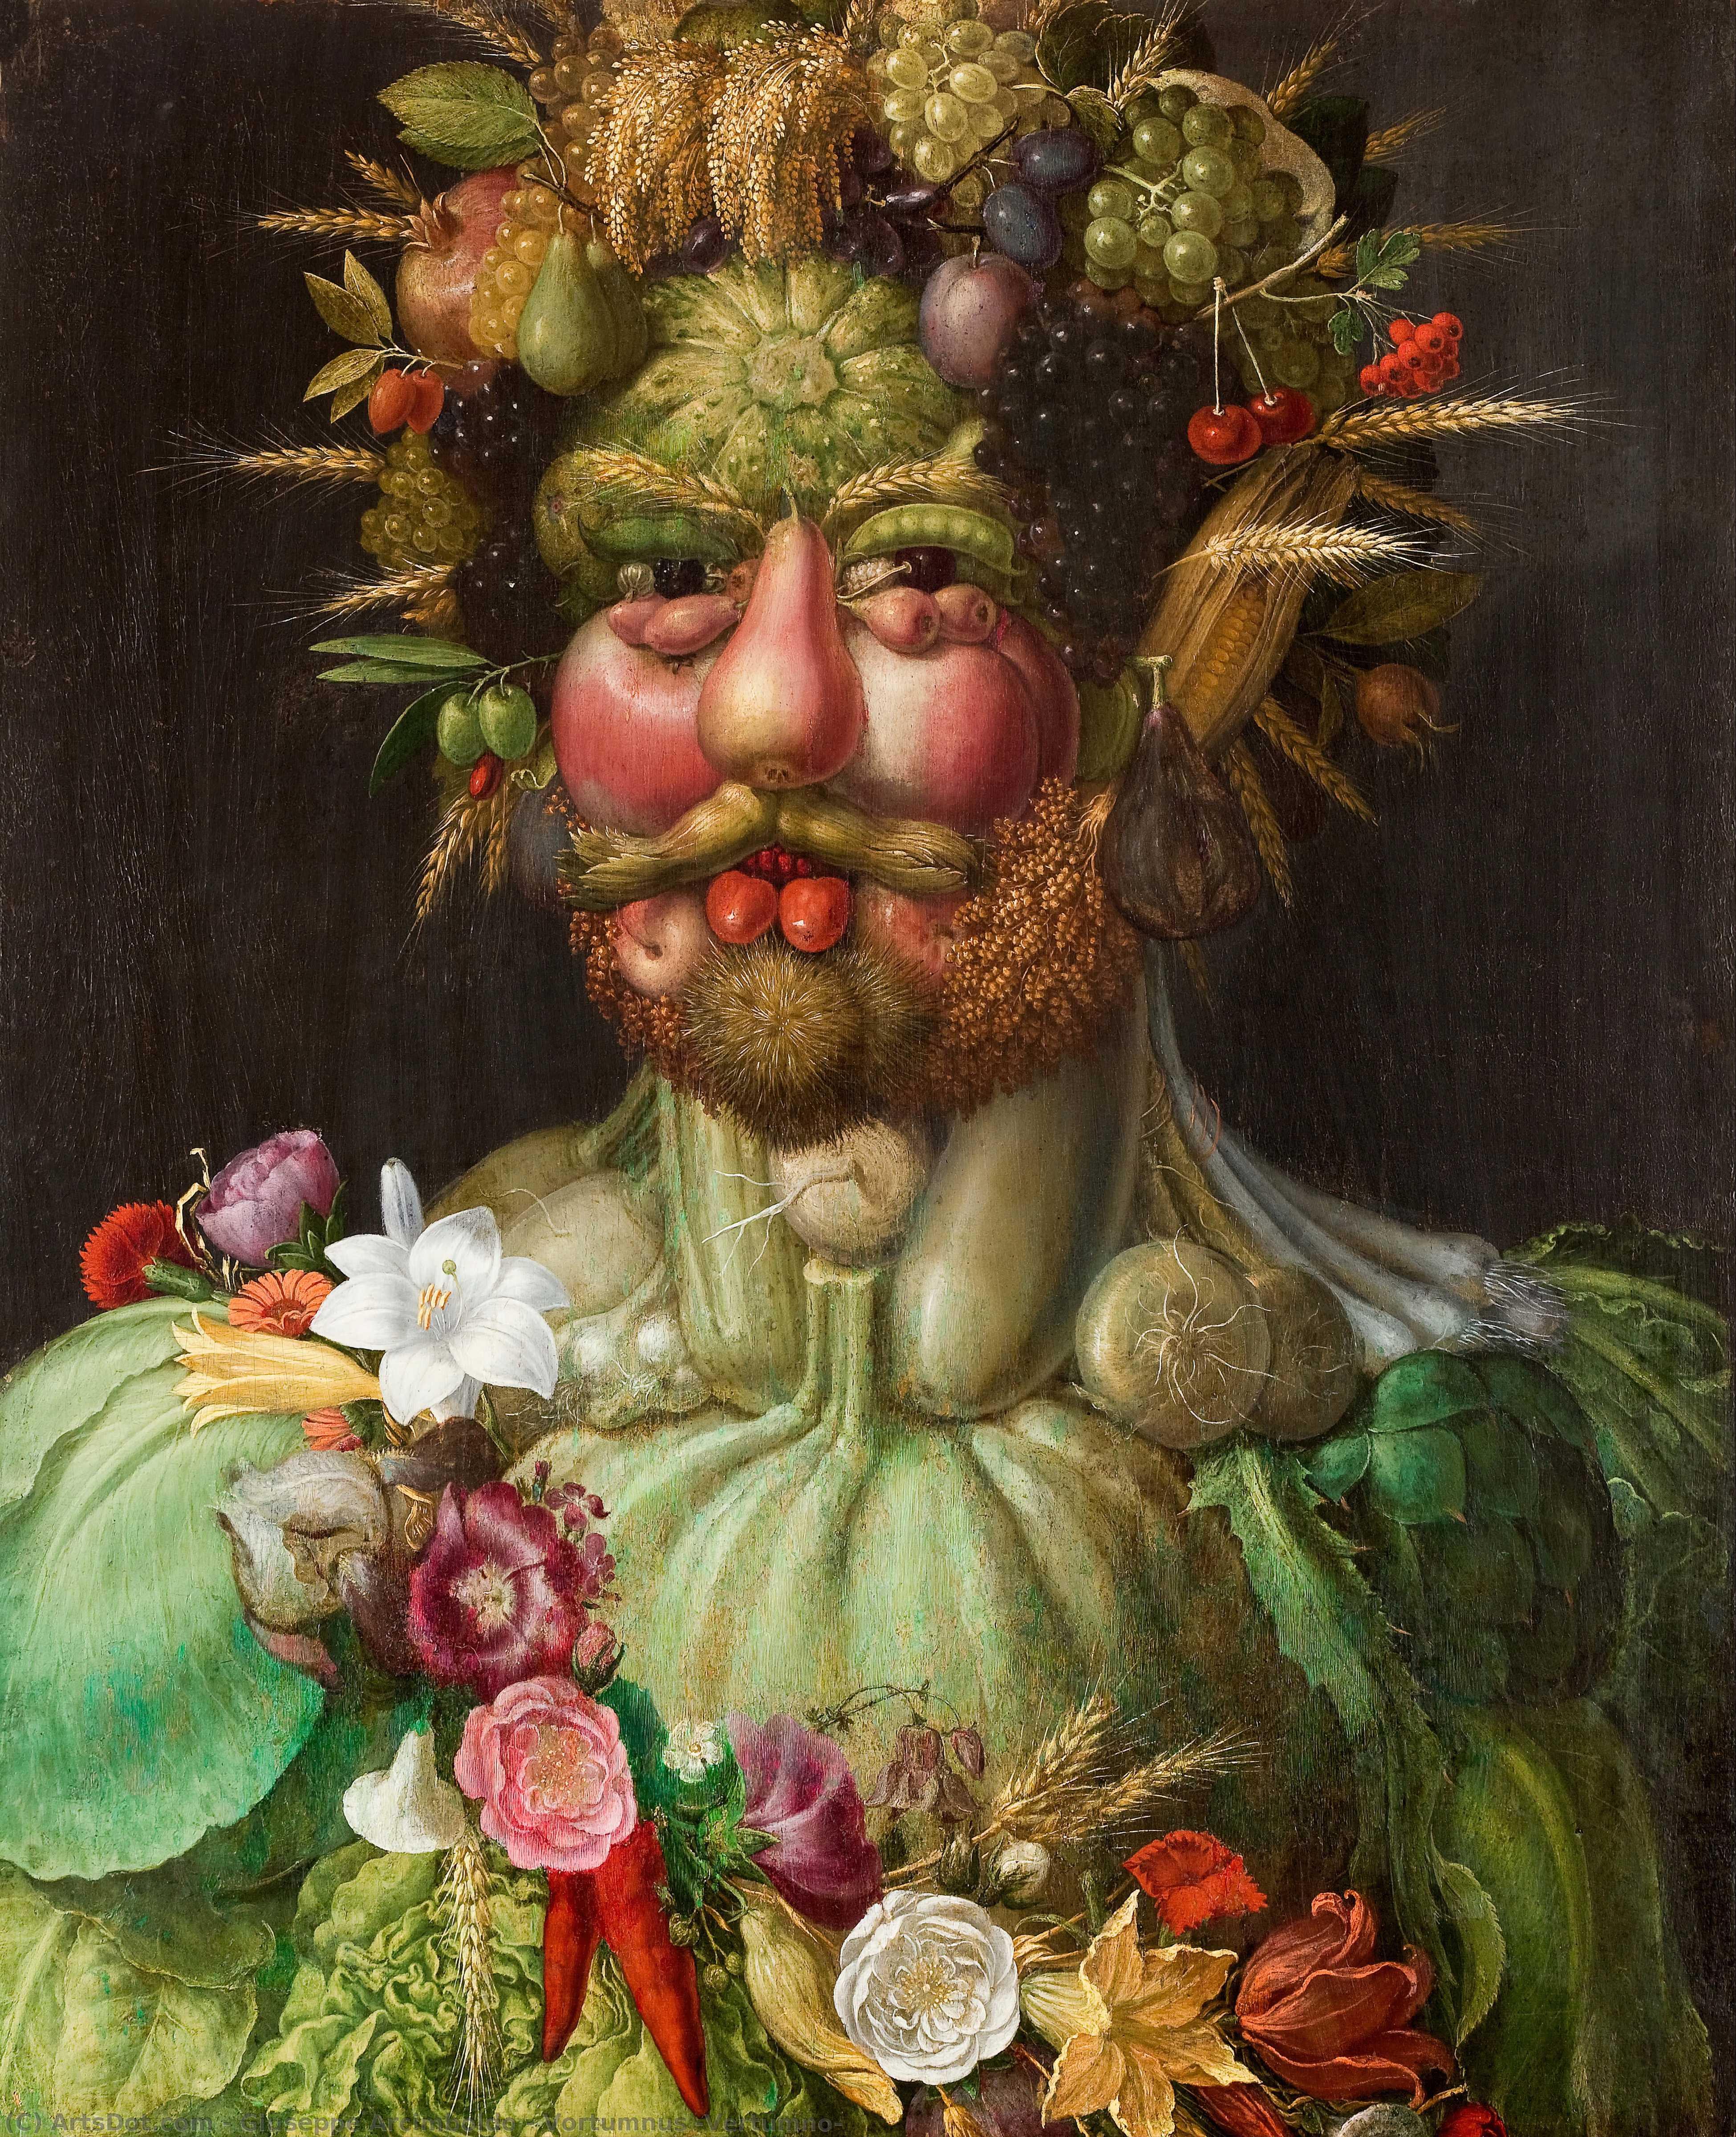 WikiOO.org - Encyclopedia of Fine Arts - Maľba, Artwork Giuseppe Arcimboldo - Vortumnus (Vertumno)